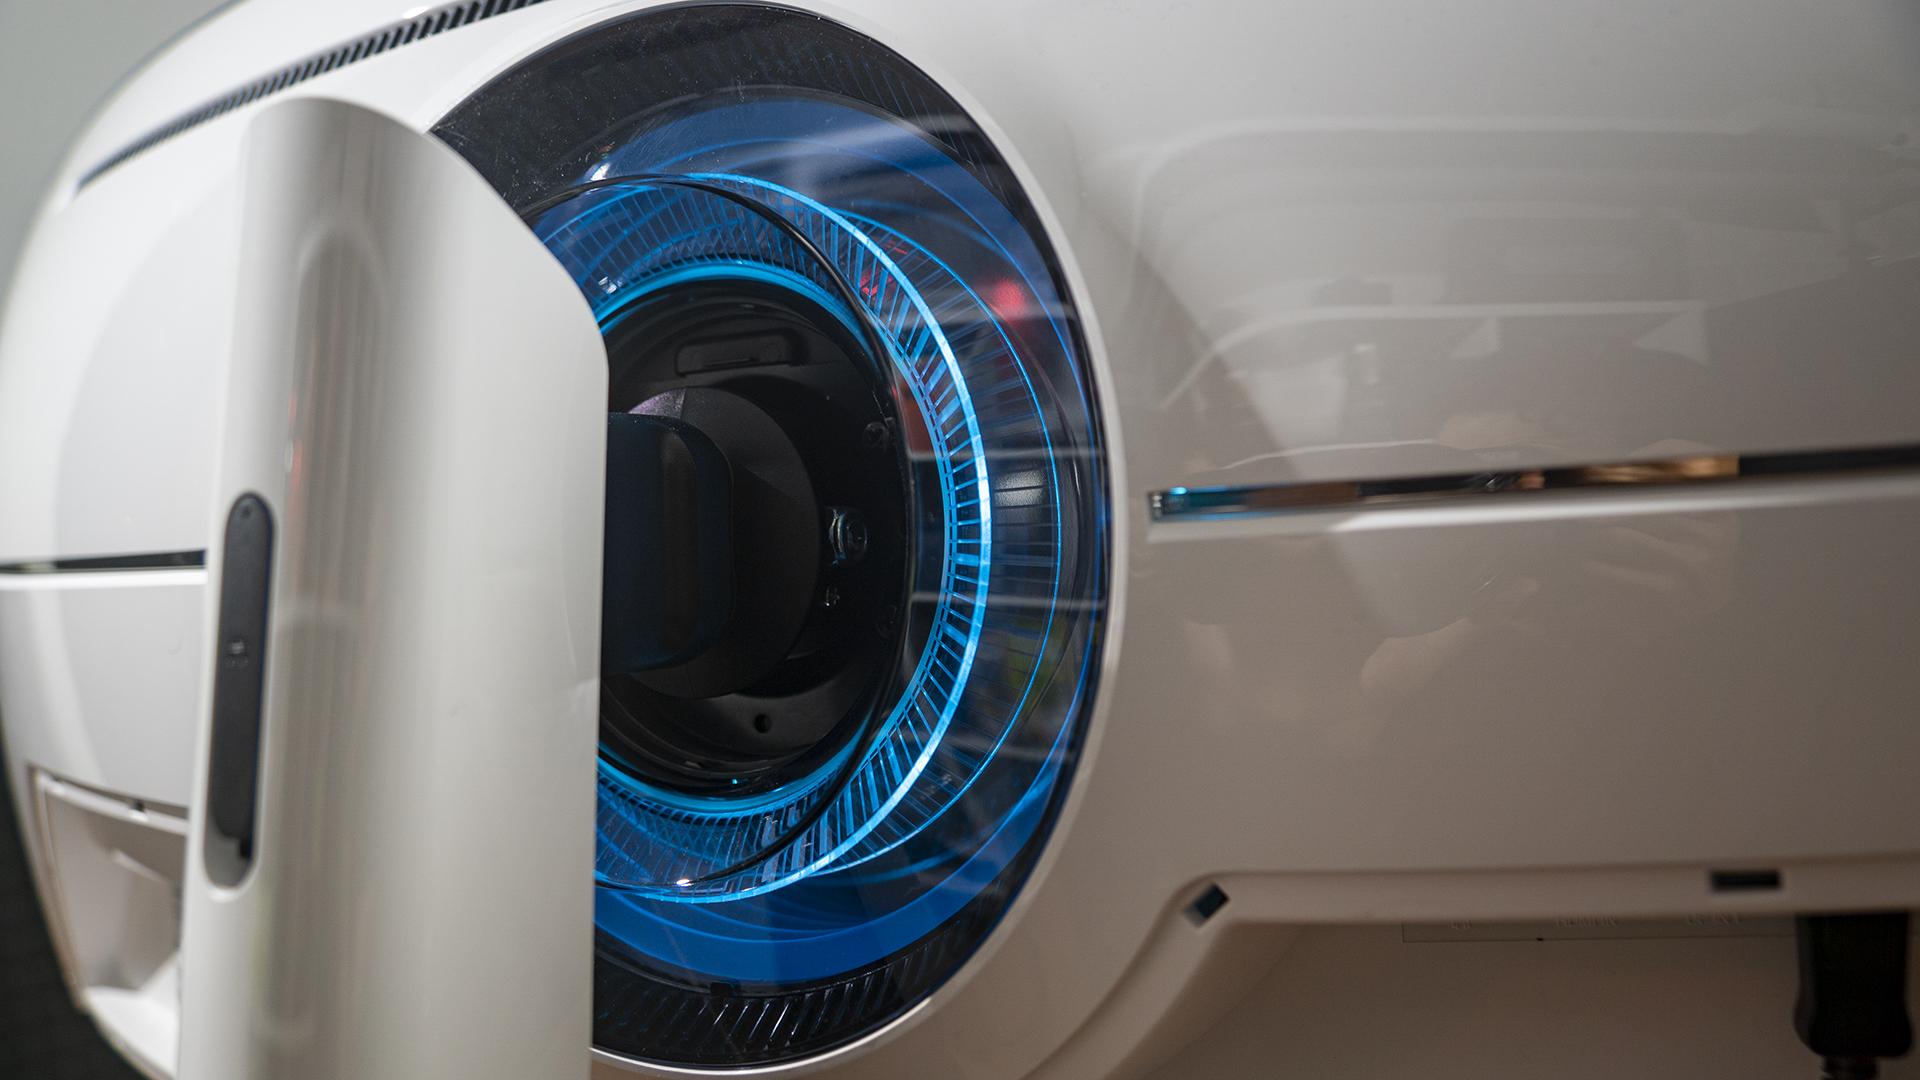 Samsung Odyssey G9 Infinity Core Lighting